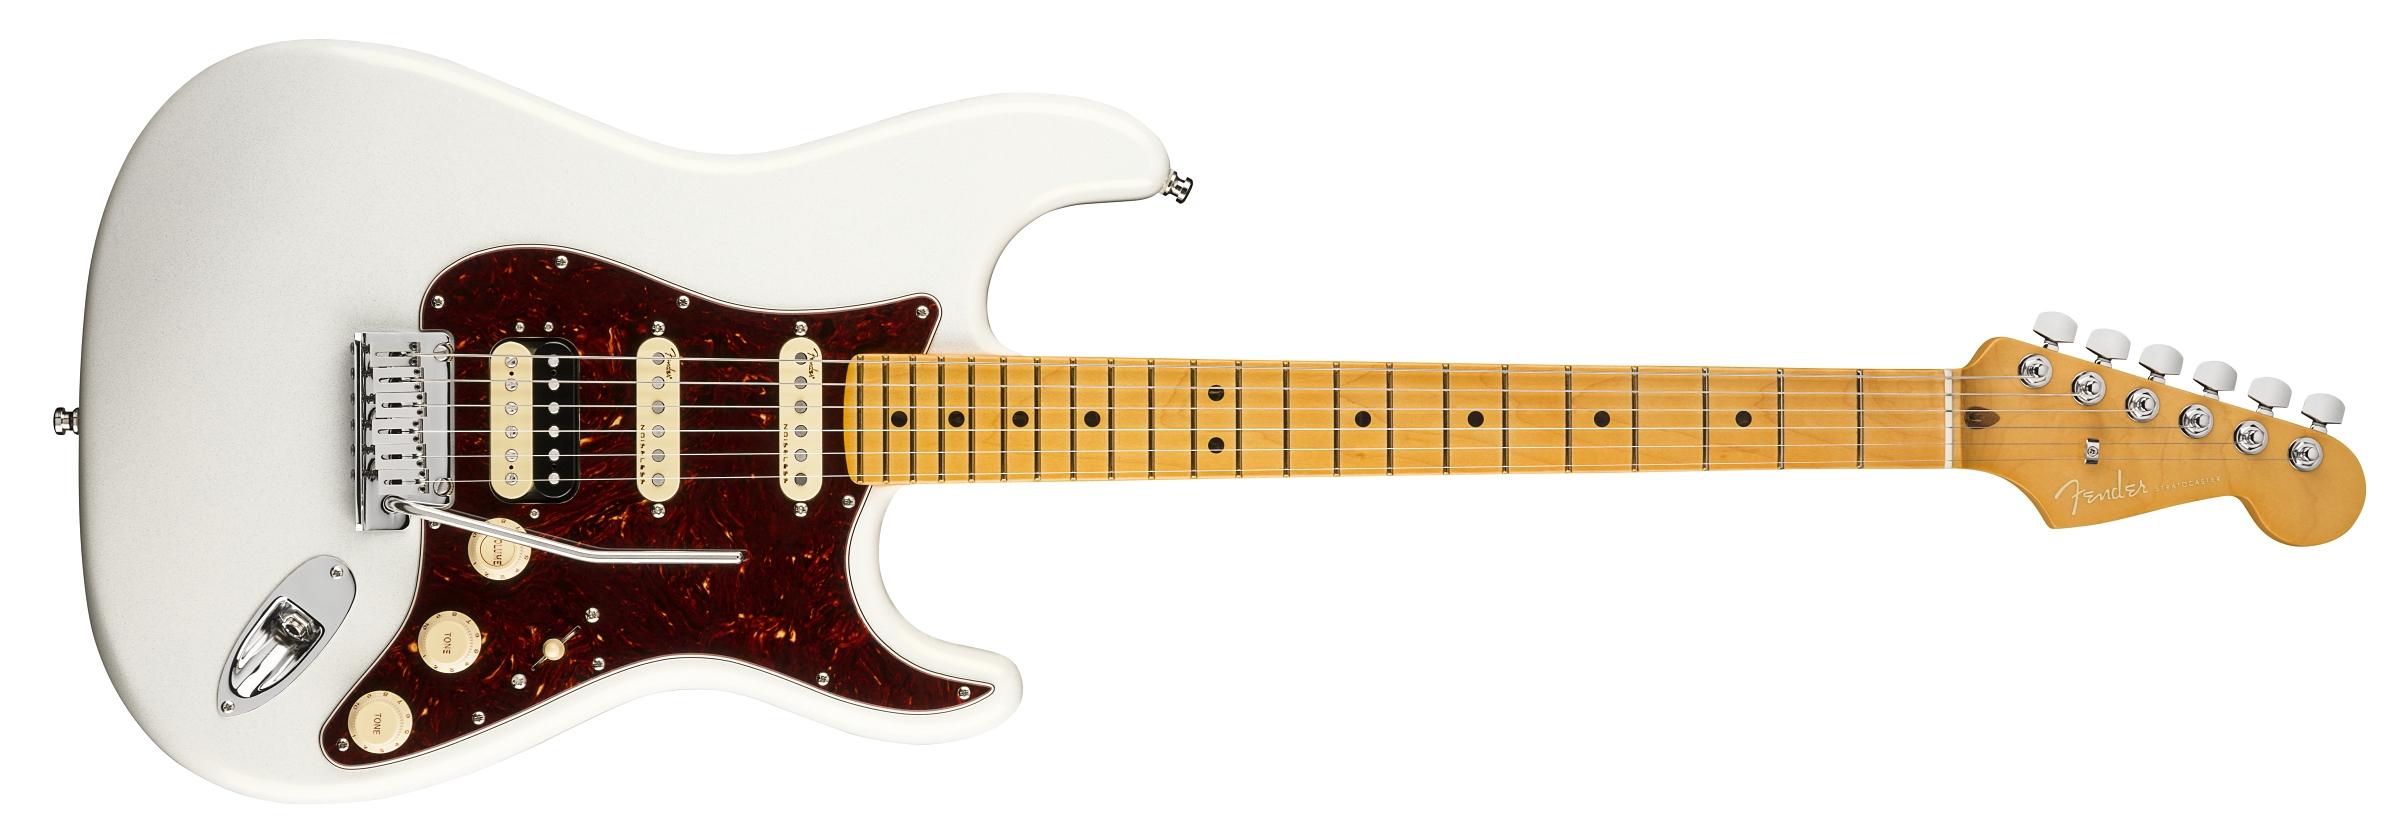 FENDER-American-Ultra-Stratocaster-HSS-MN-Arctic-Pearl-0118022781-sku-23899